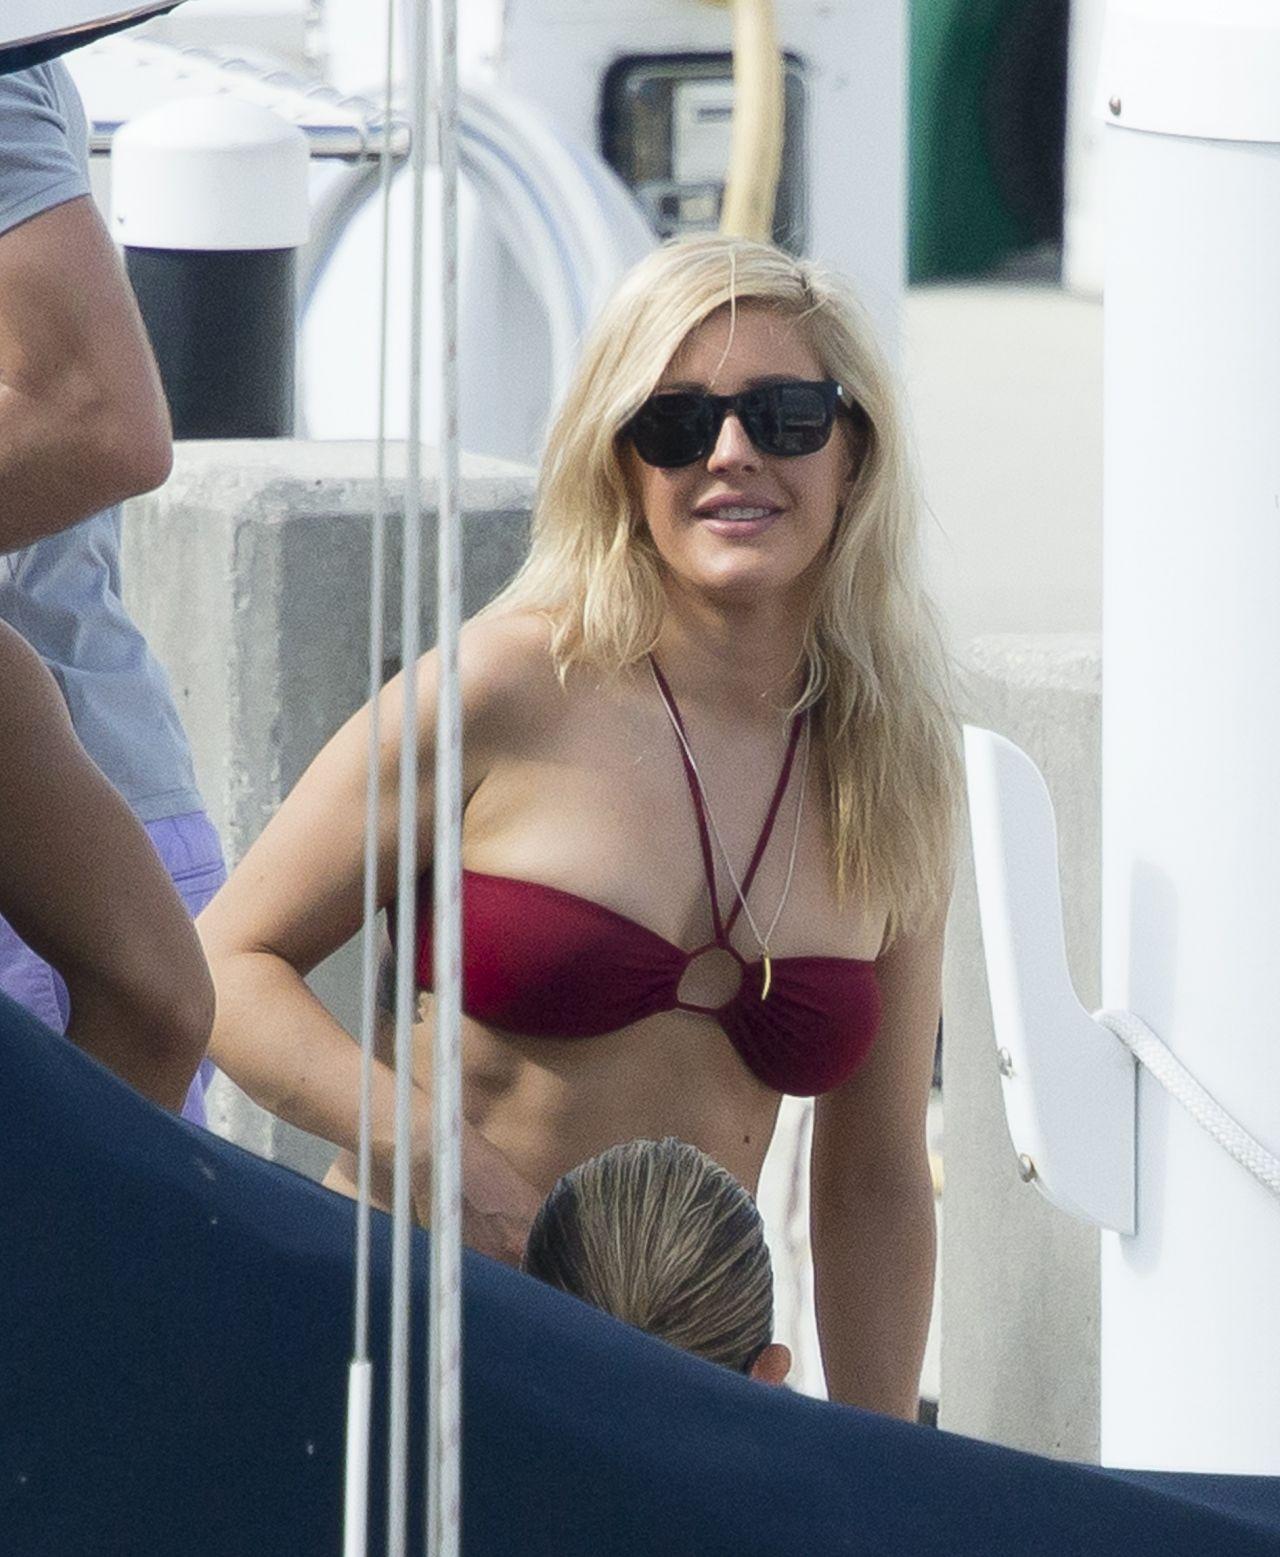 Fappening Ellie Goulding nude photos 2019